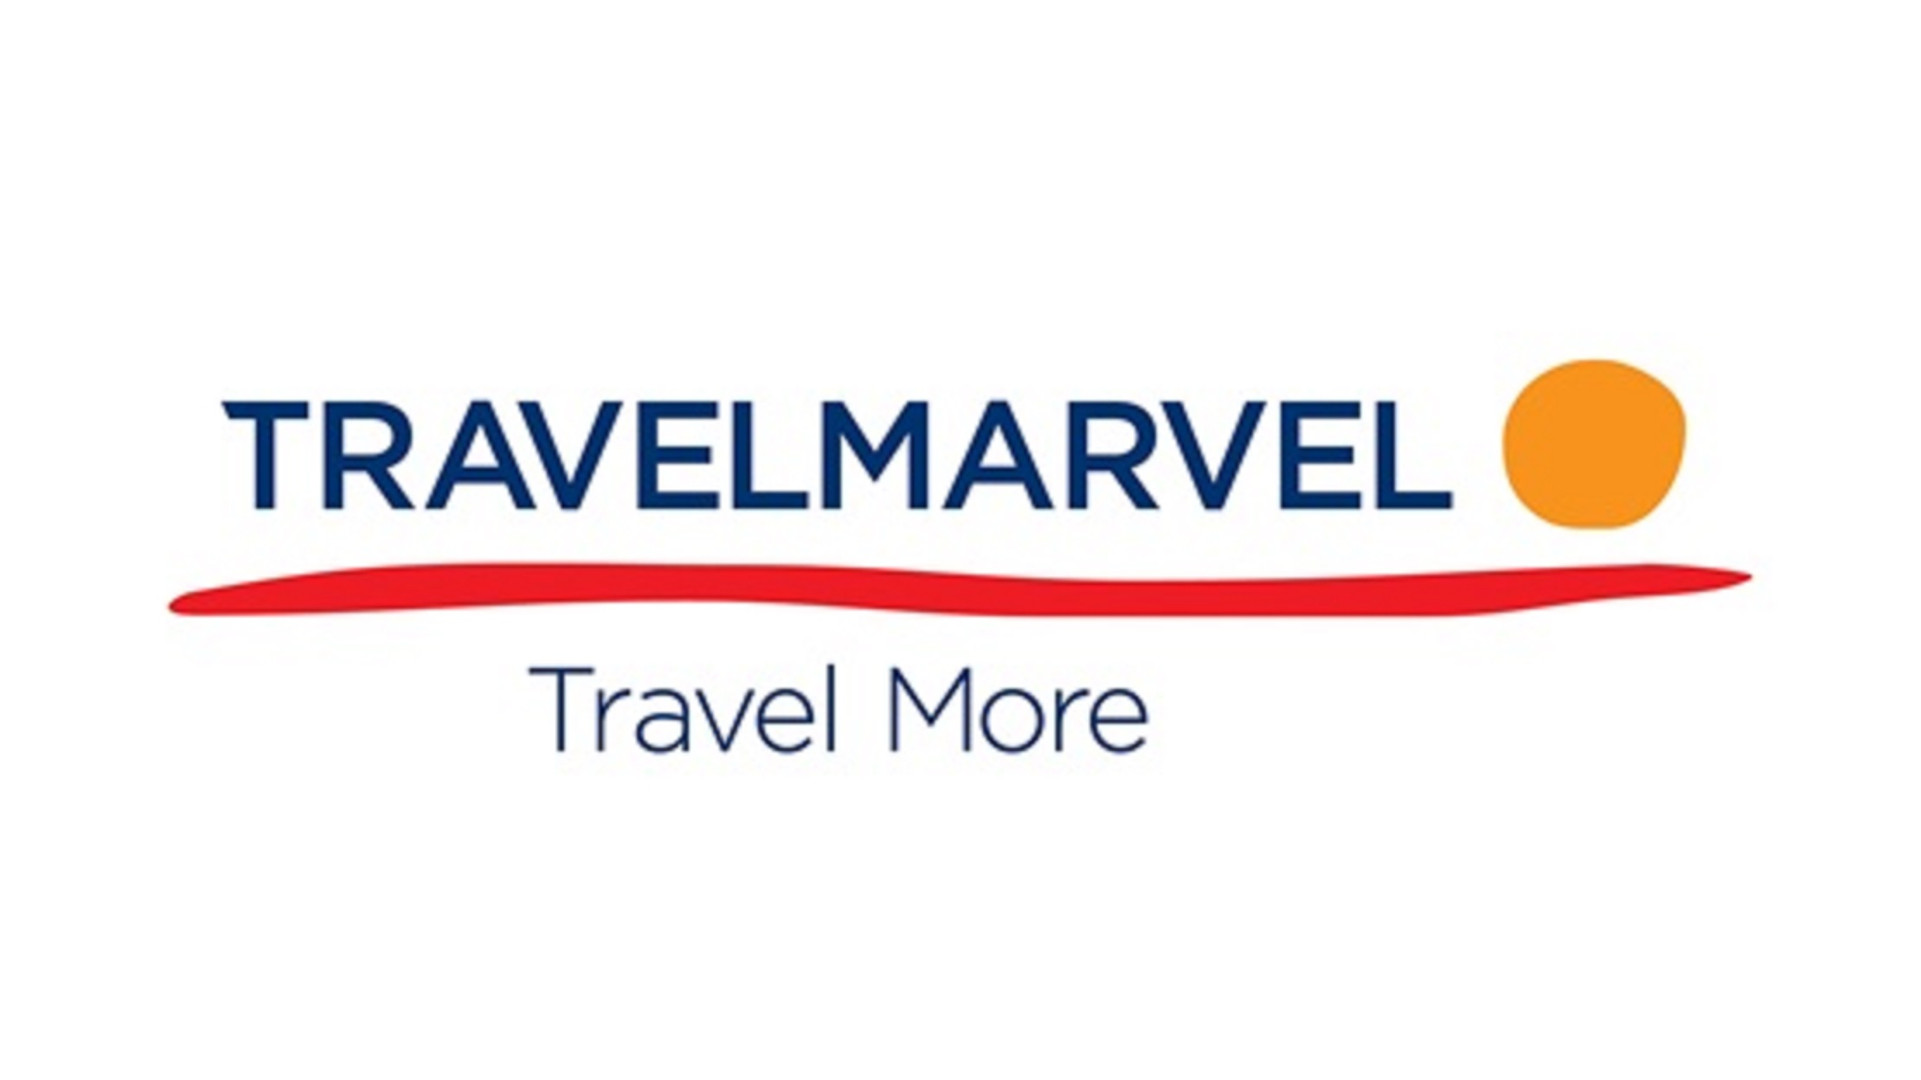 gi-generic-logos-travelmarvel-16-9.jpg